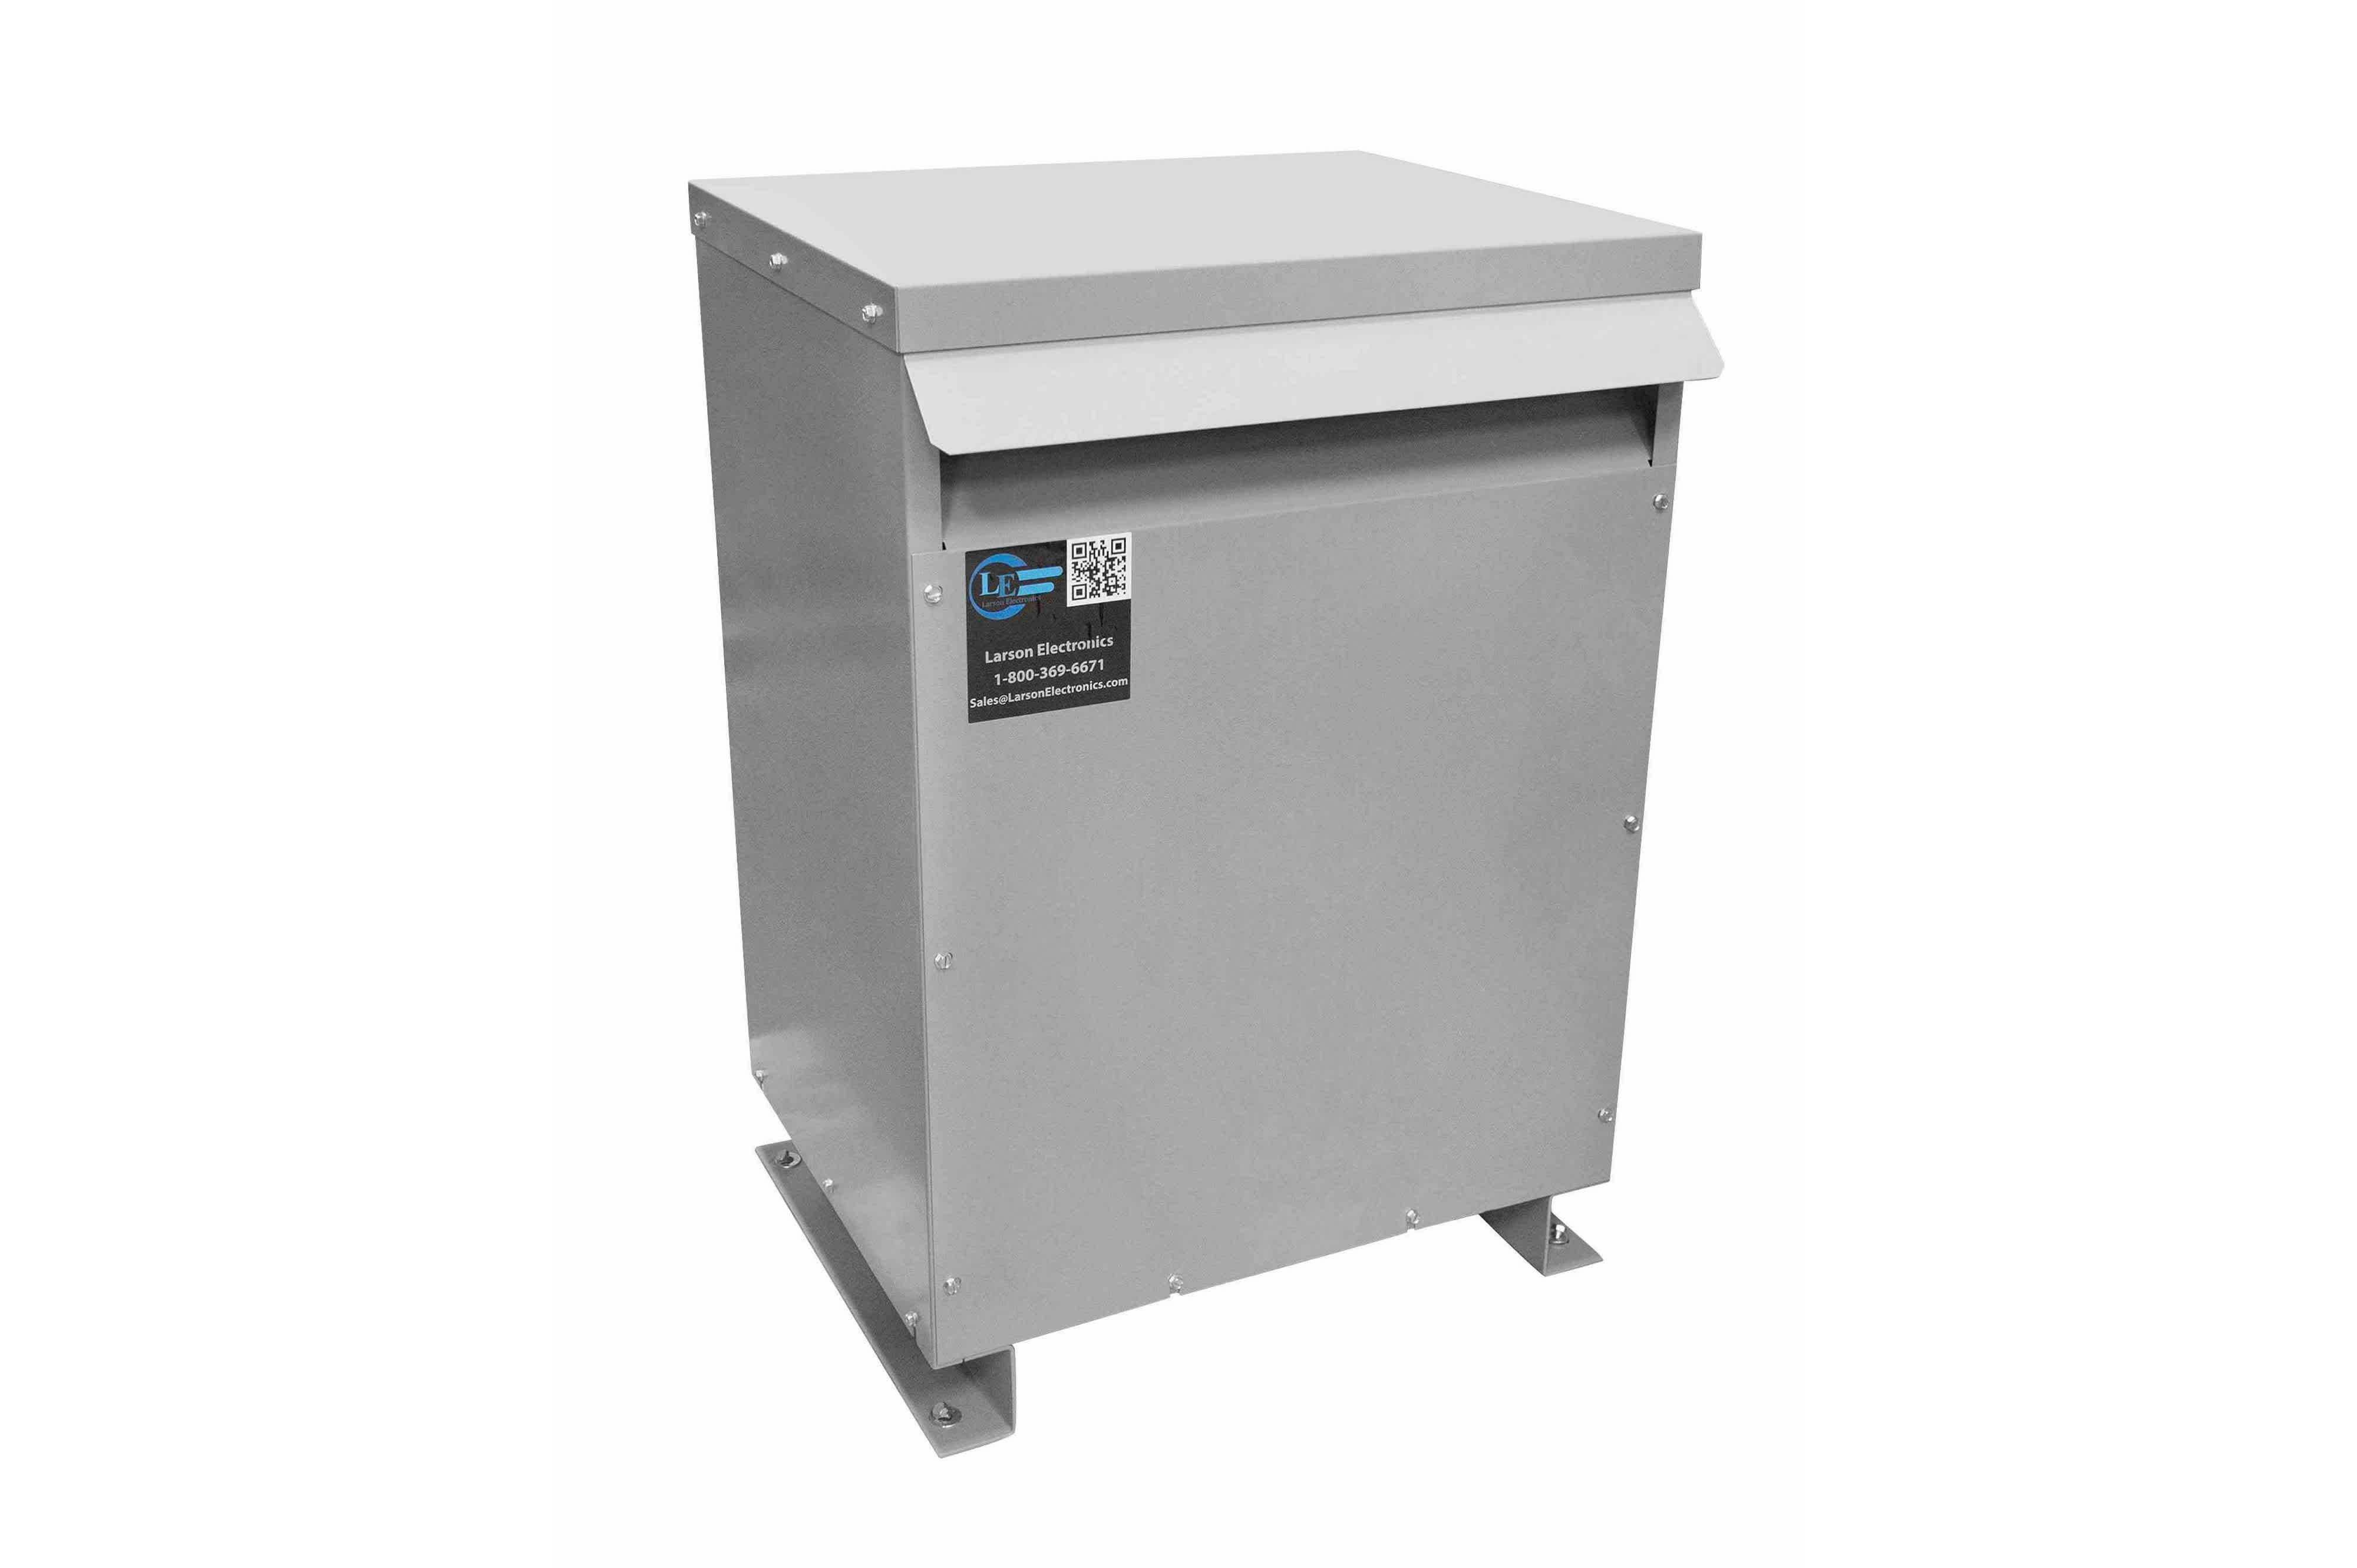 26 kVA 3PH Isolation Transformer, 415V Wye Primary, 208Y/120 Wye-N Secondary, N3R, Ventilated, 60 Hz